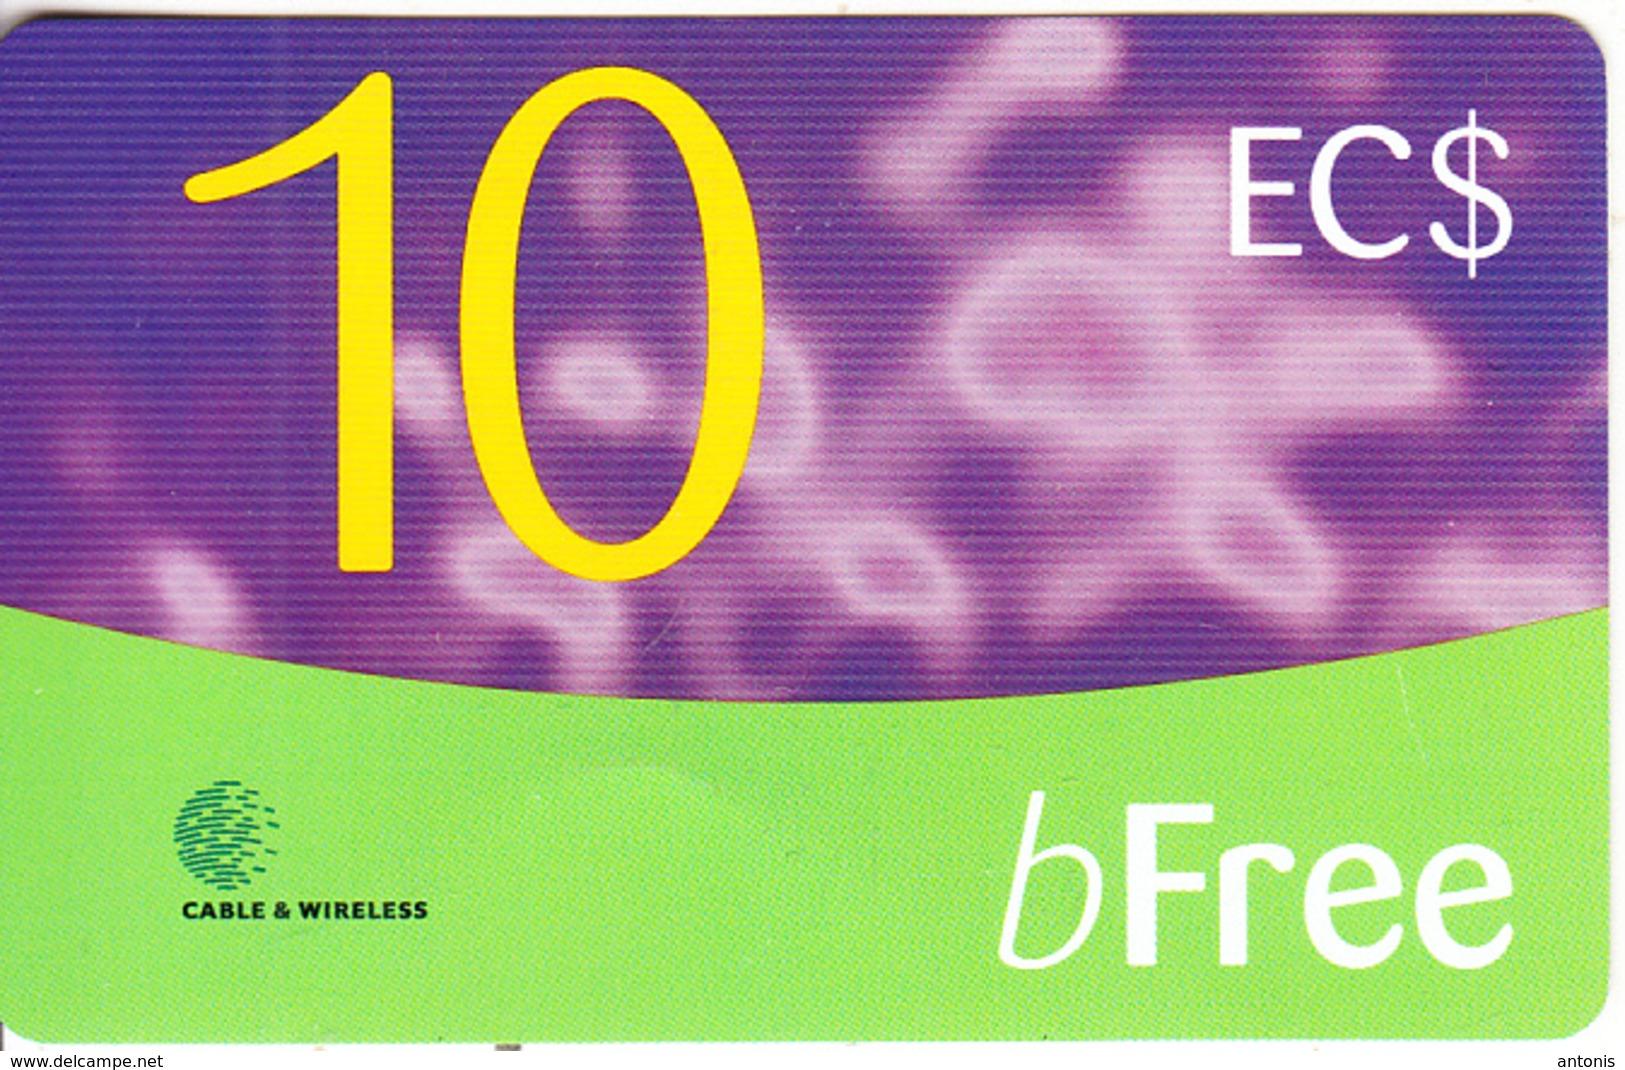 ST. VINCENT & THE GRENADINES - C&W Prepaid Card EC$10, Used - St. Vincent & The Grenadines